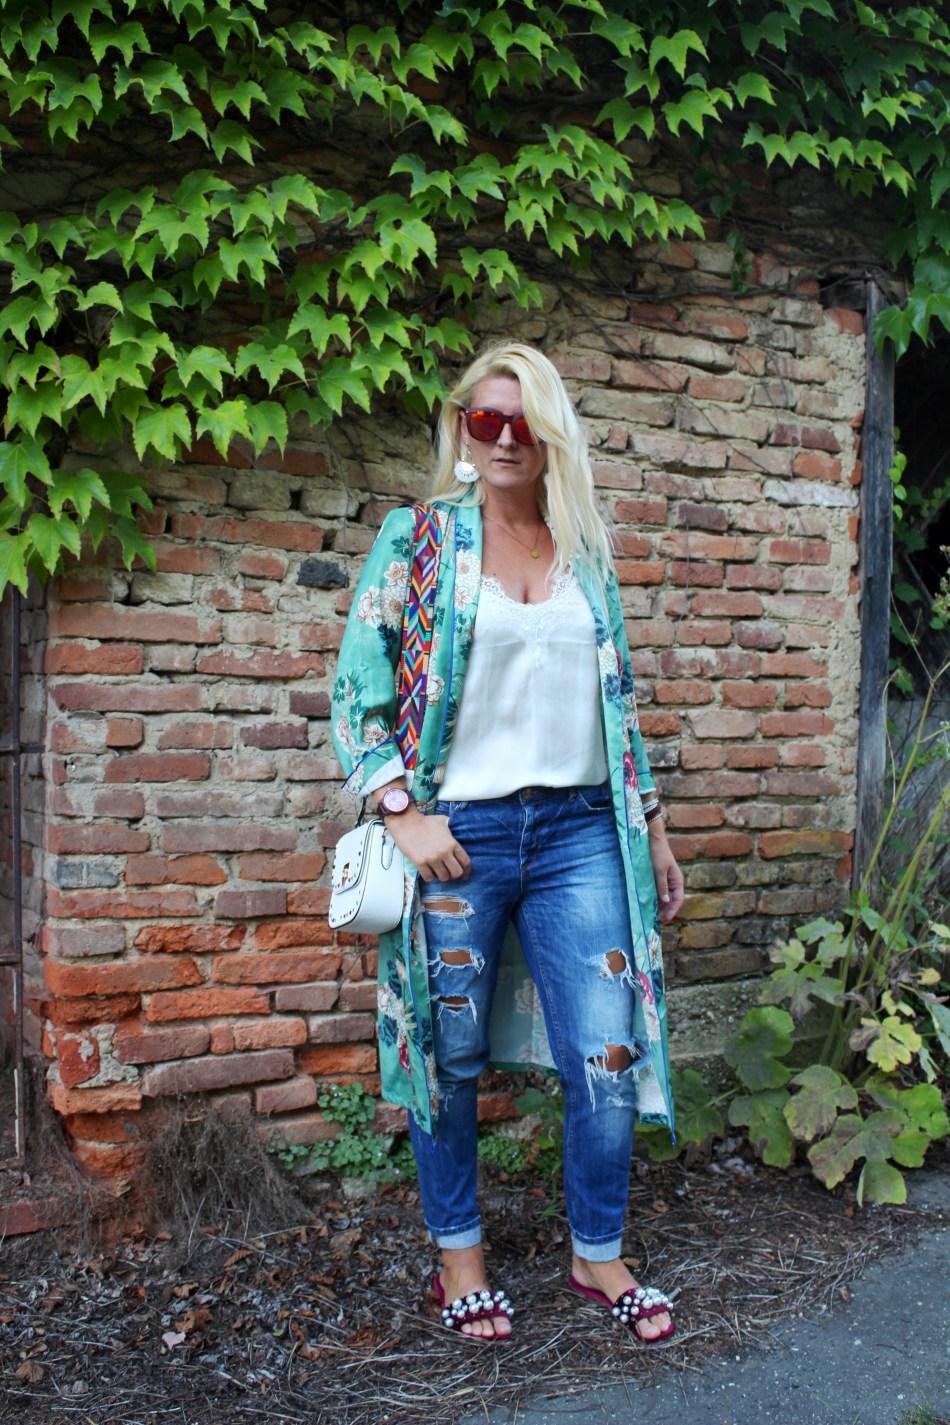 Kimono-MiuMiu-Adiletten-Valentino-Rockstud-Bag-Denim-carrieslifestyle-Tamara-Prutsch